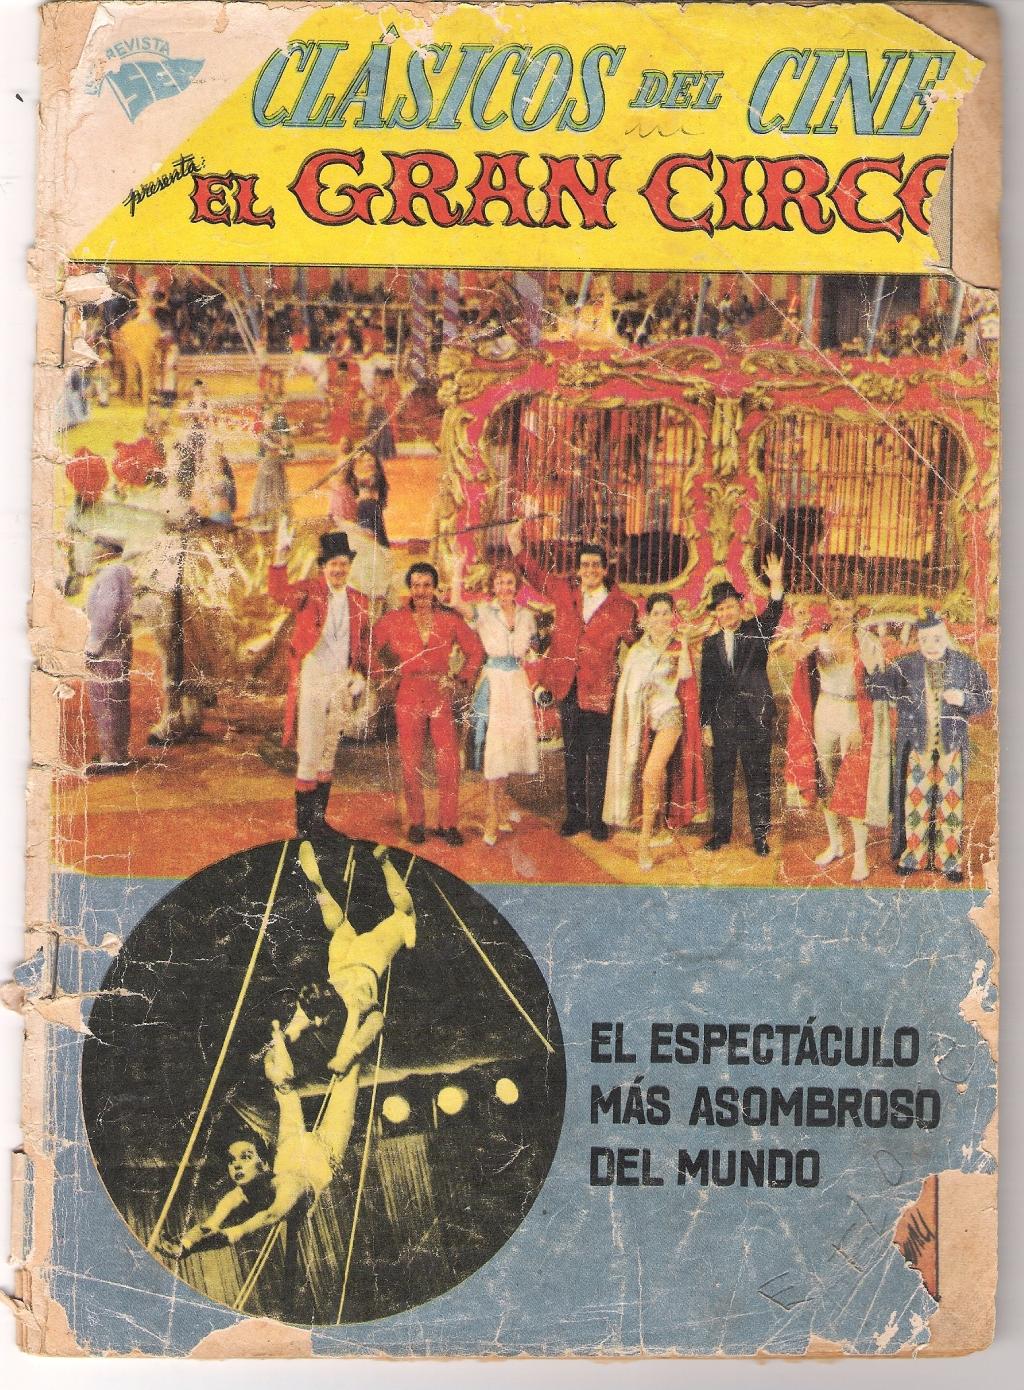 UNA REVISTA SEA - EL GRAN CIRCO, 1º DE FEBRERO DE 1960- PELICULA CON VICTOR MATURE, RED BUTTONS Y RHONDA FLEMING